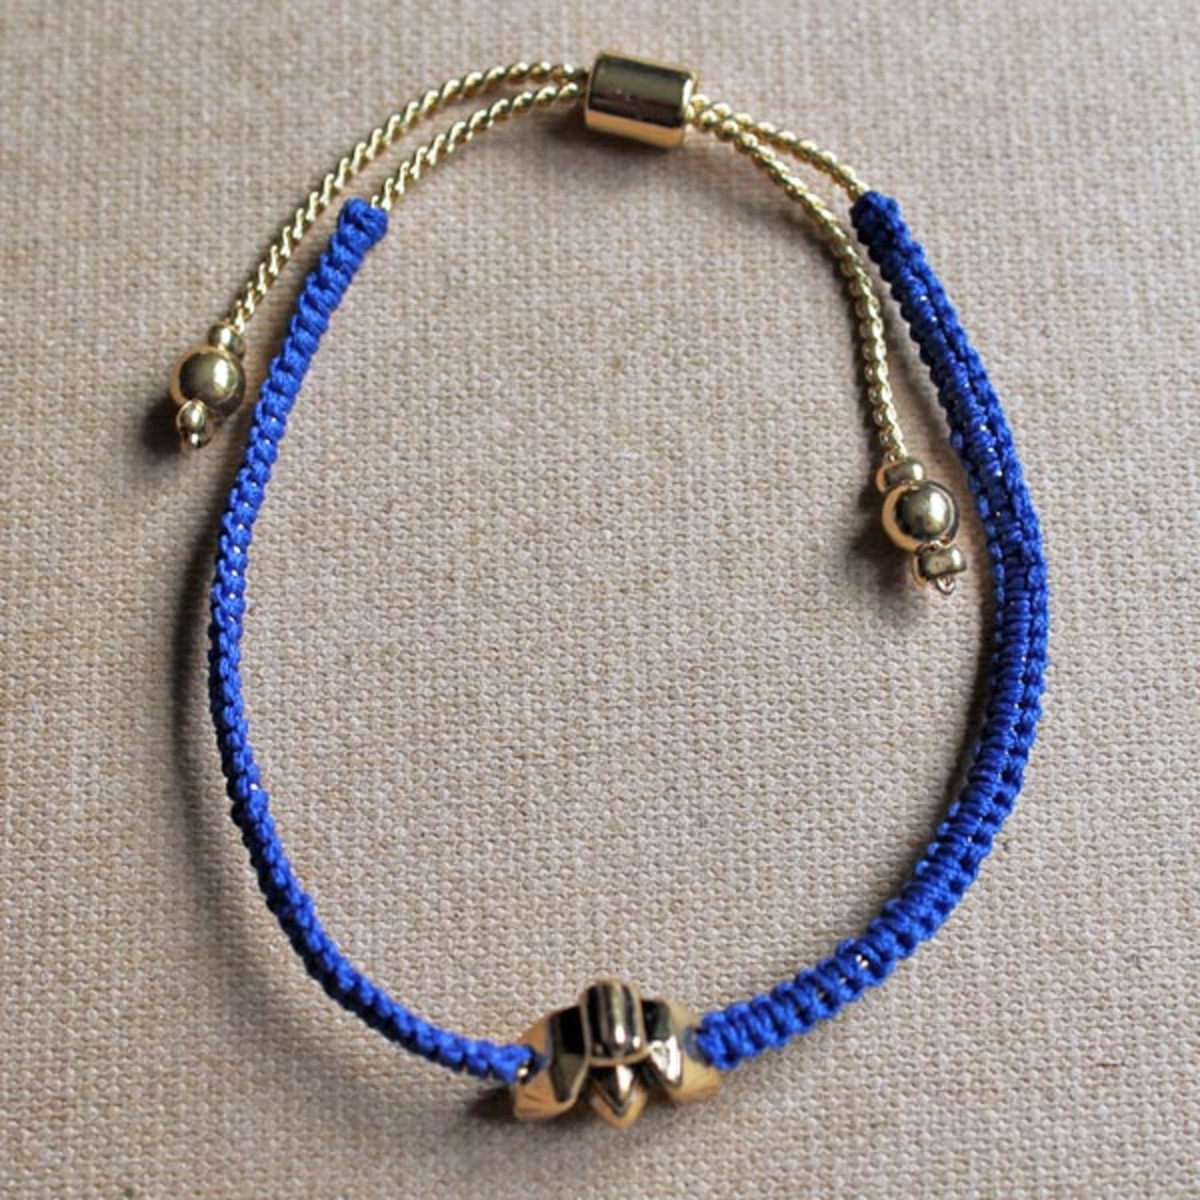 Jenny Bird x Burt's Bees bracelet